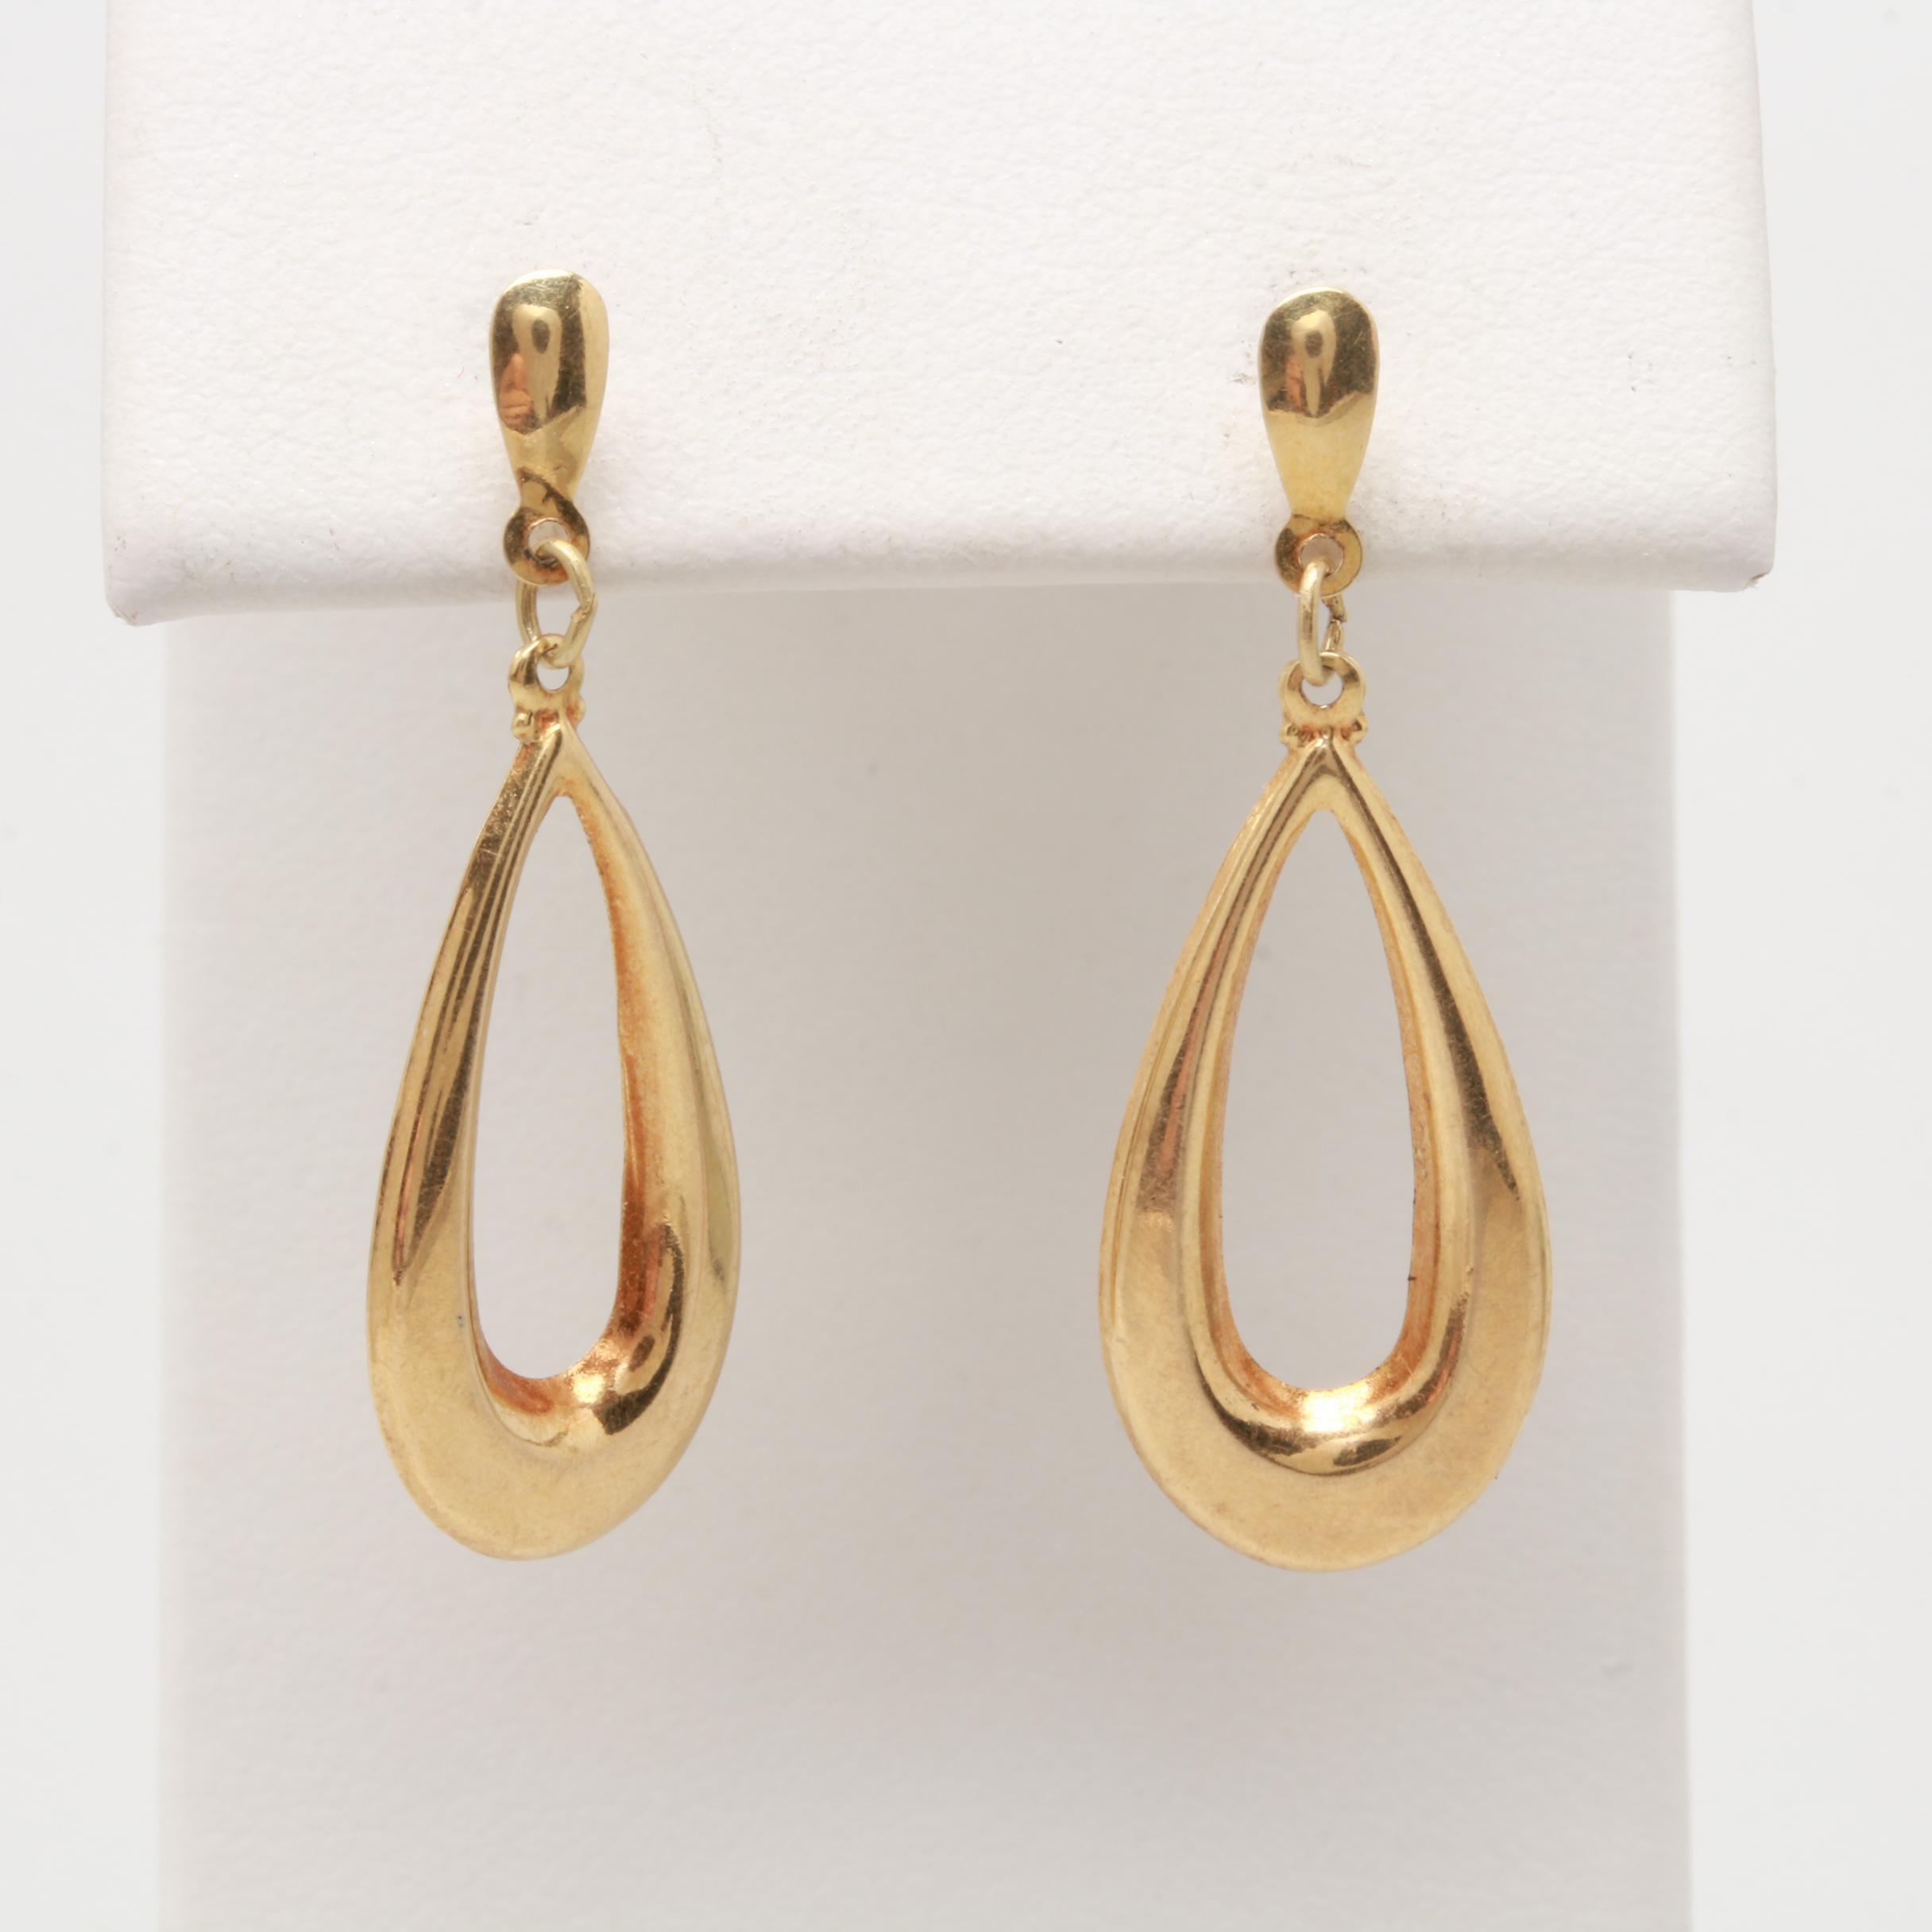 14K Yellow Gold Elongated Oval Dangle Earrings